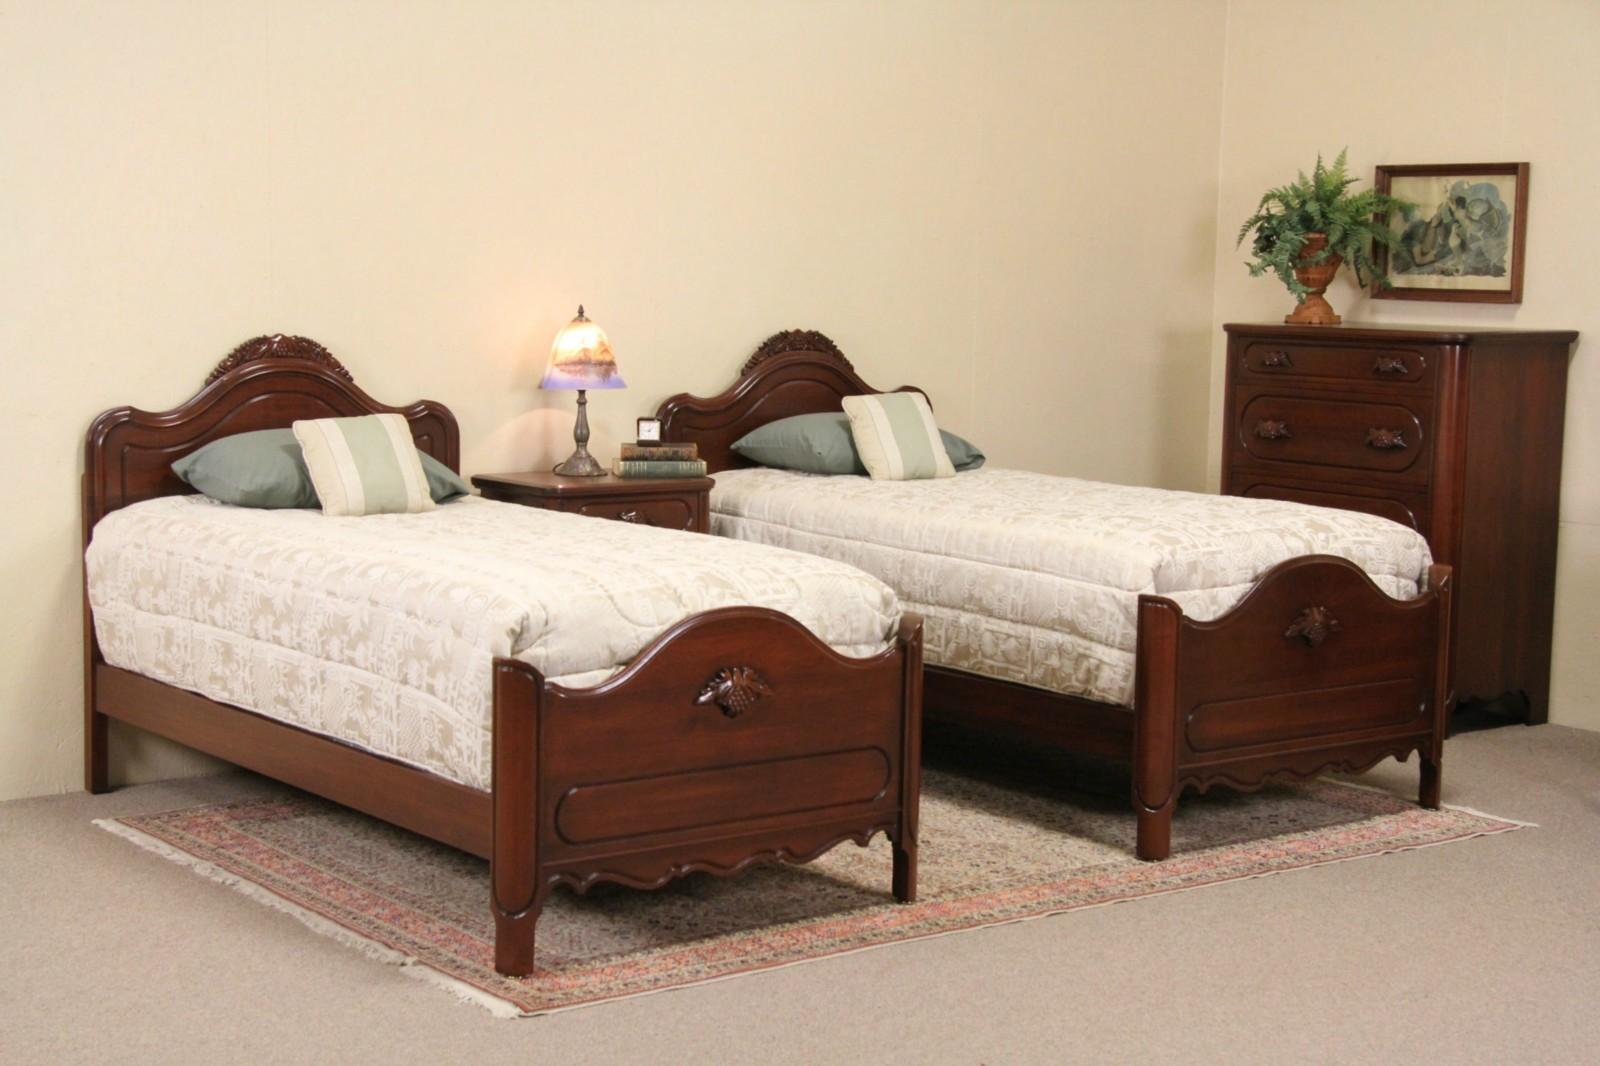 Sold Davis Signed 1950 Vintage 4 Piece Bedroom Set Twin Beds Carved Grapes Harp Gallery